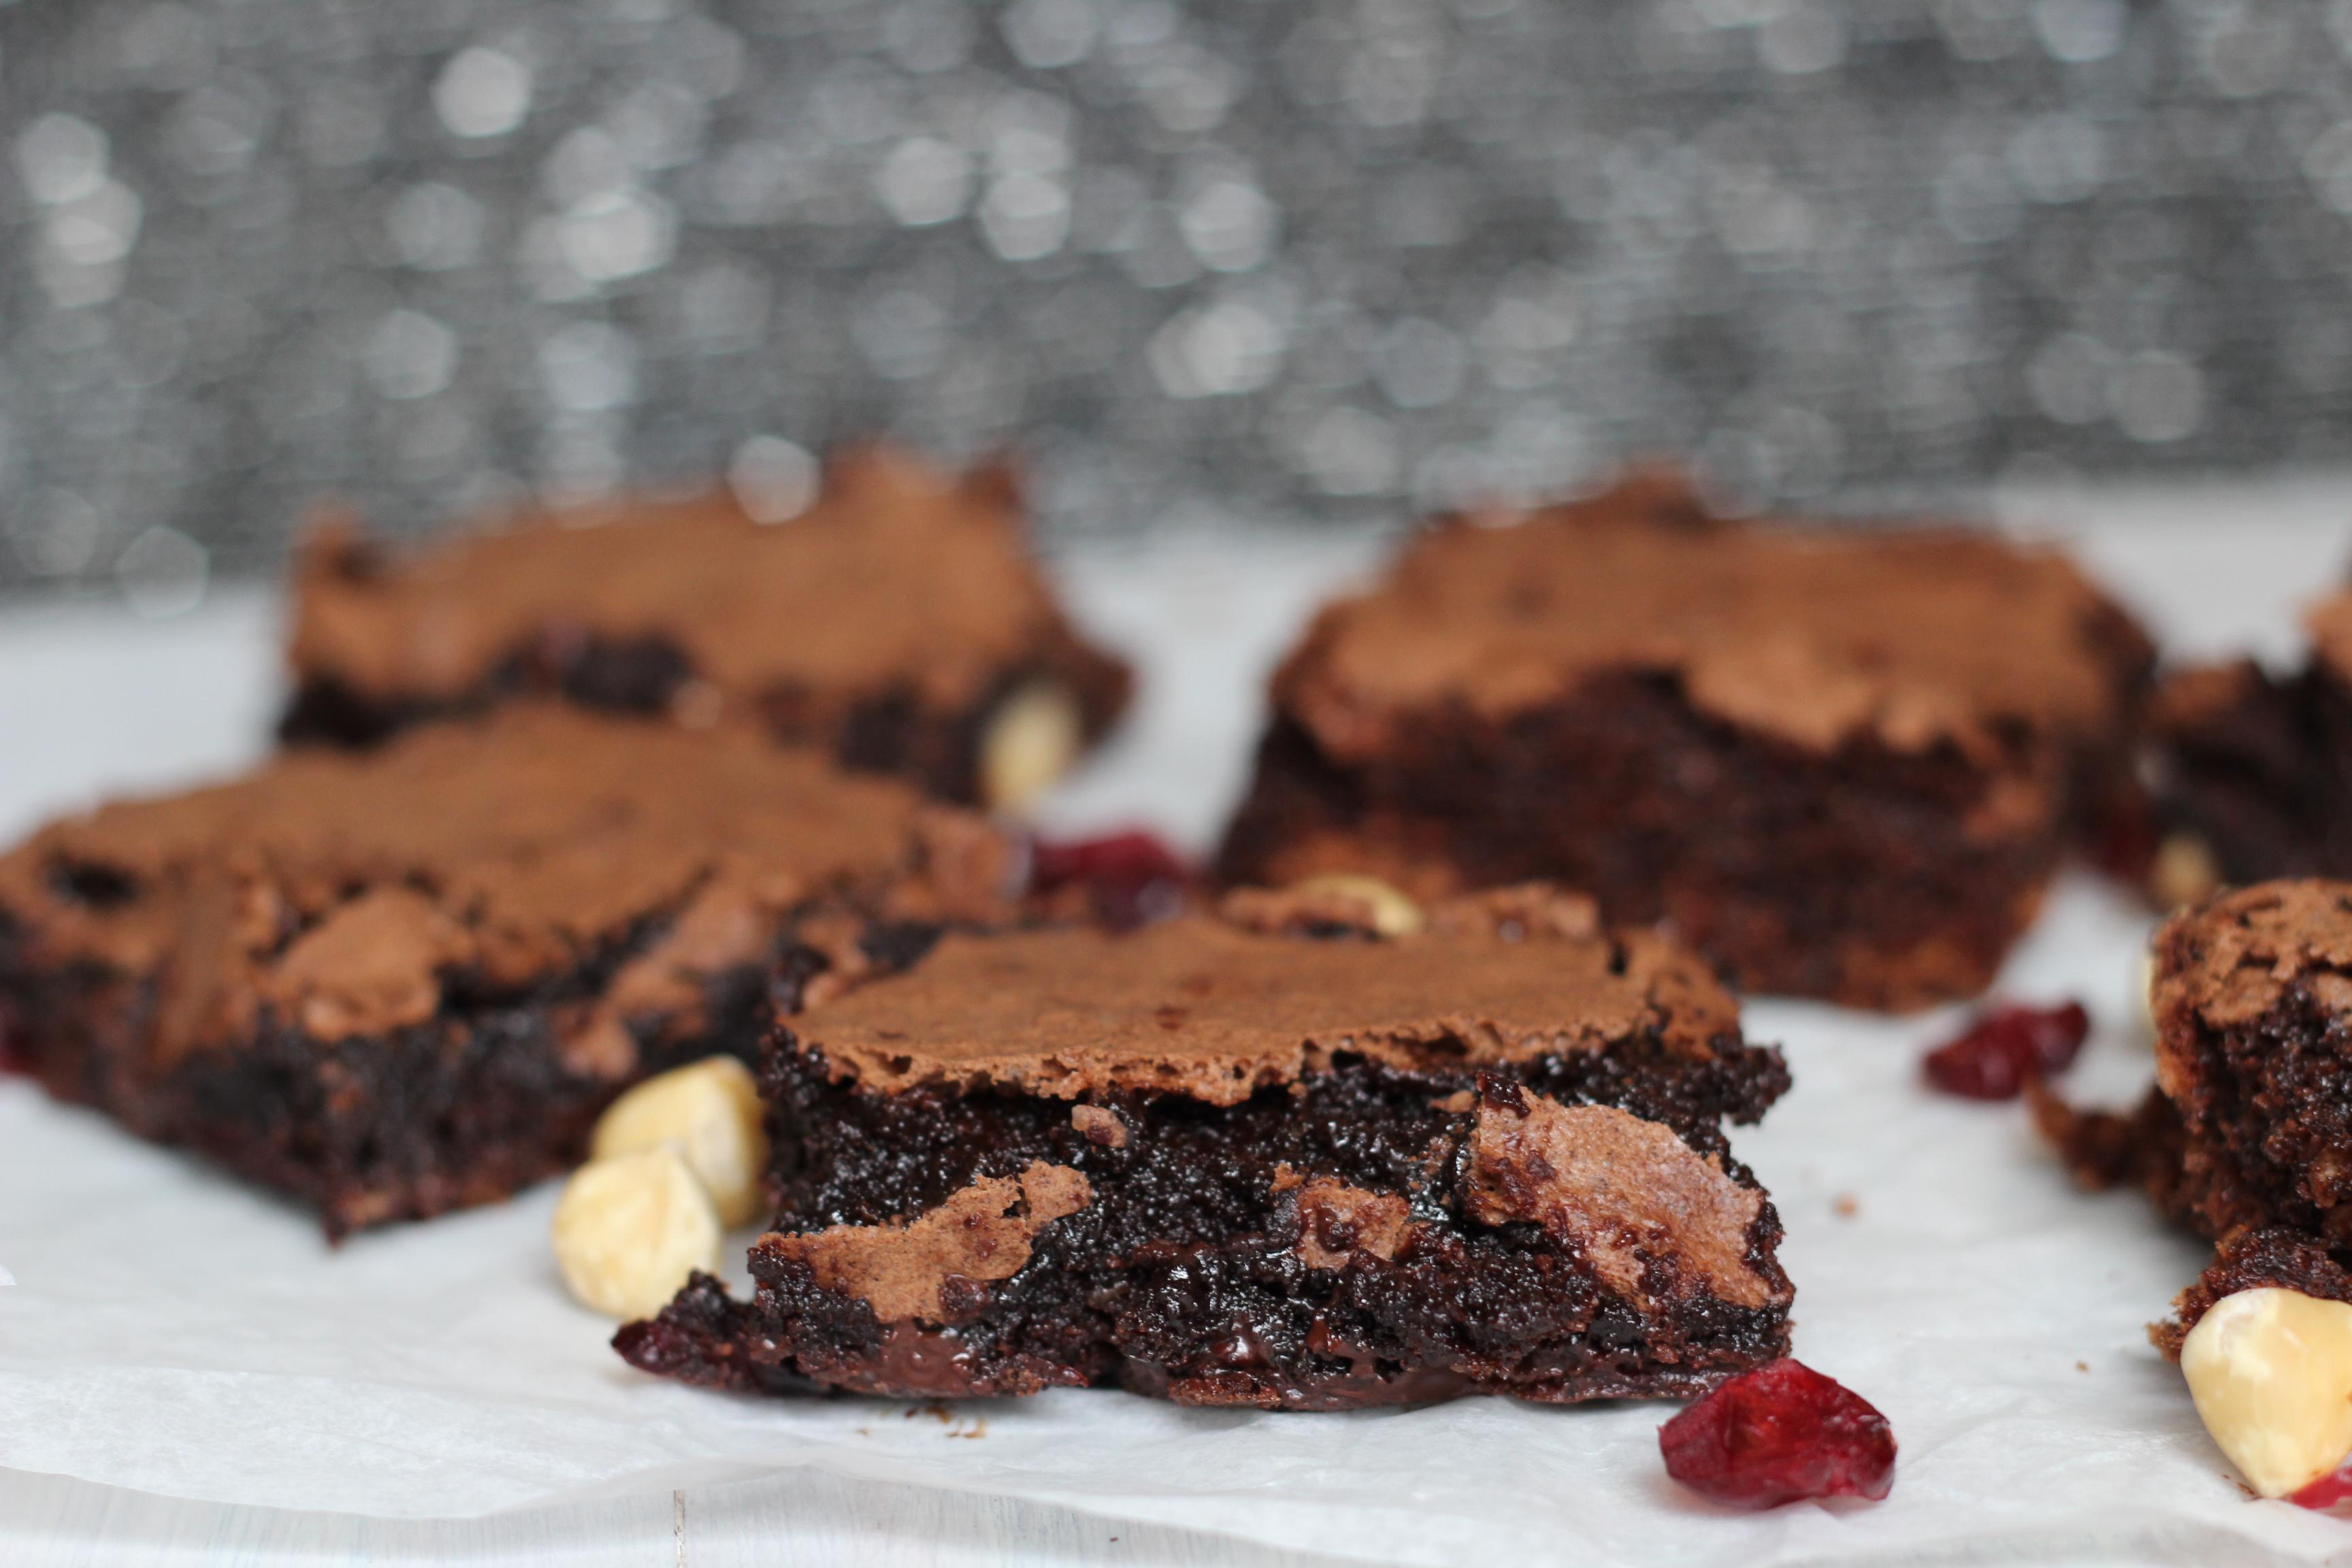 Twice Baked Chocolate Fudge Cake